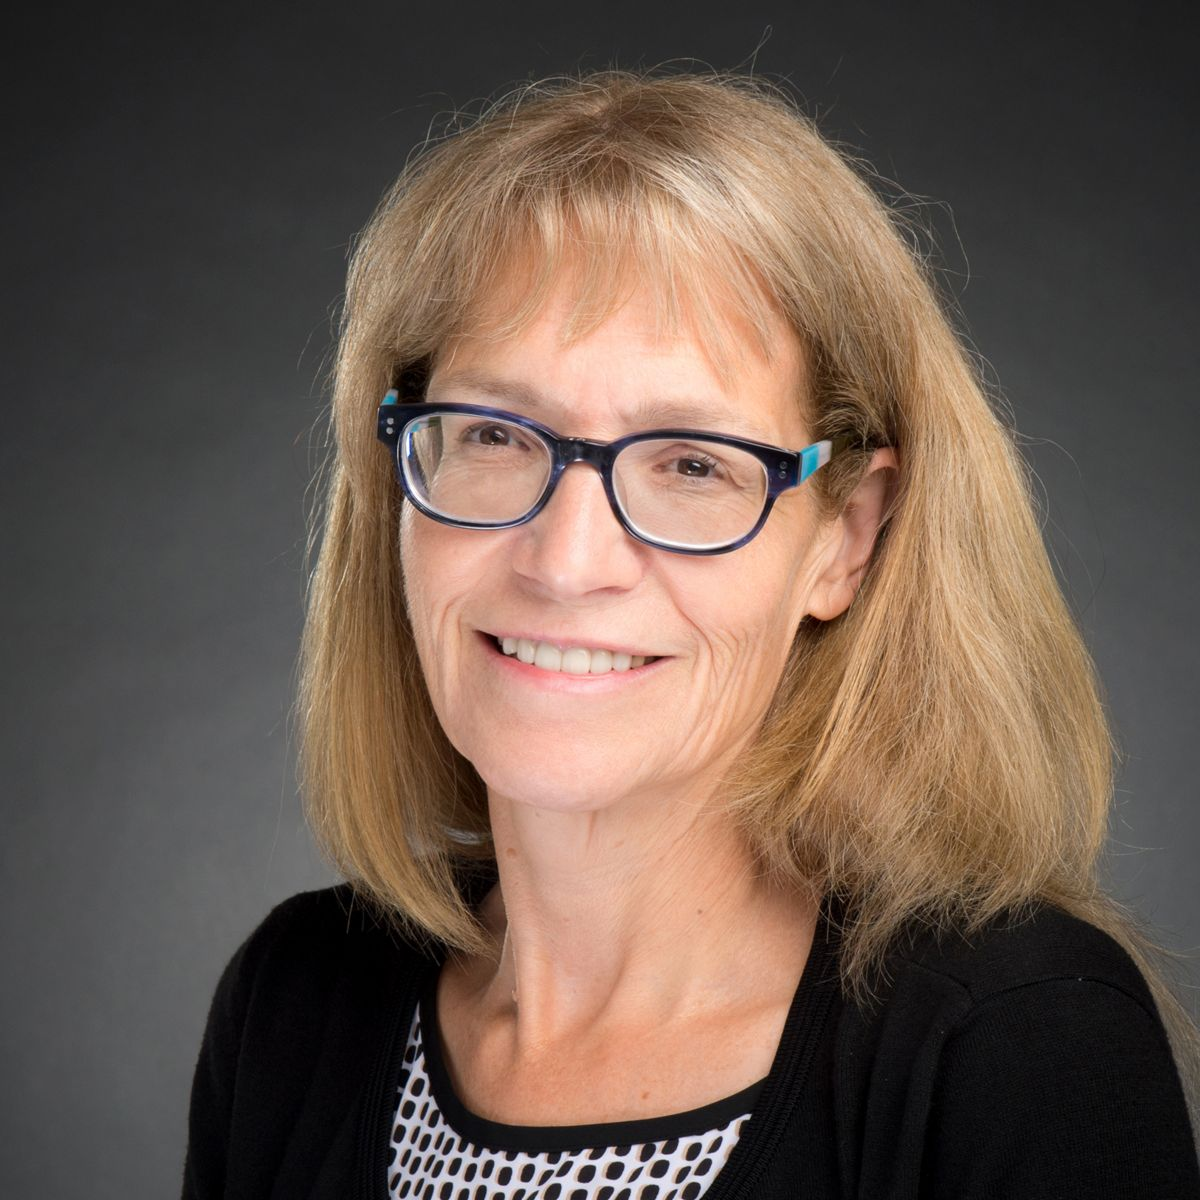 Dr. Kirsten Ness